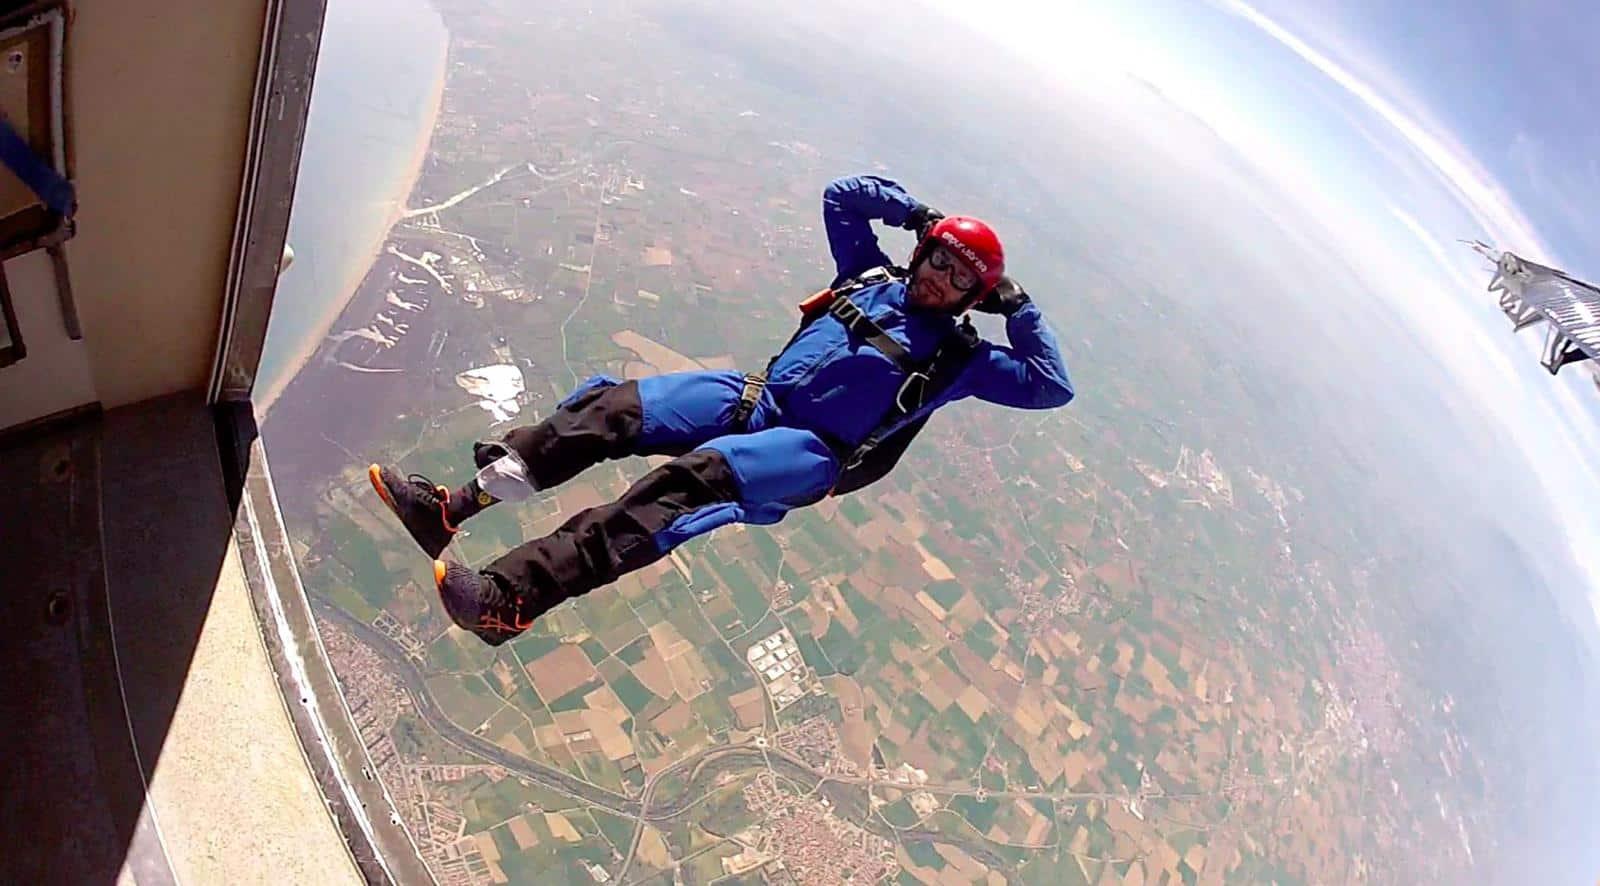 Raphael Granito Skydive 1